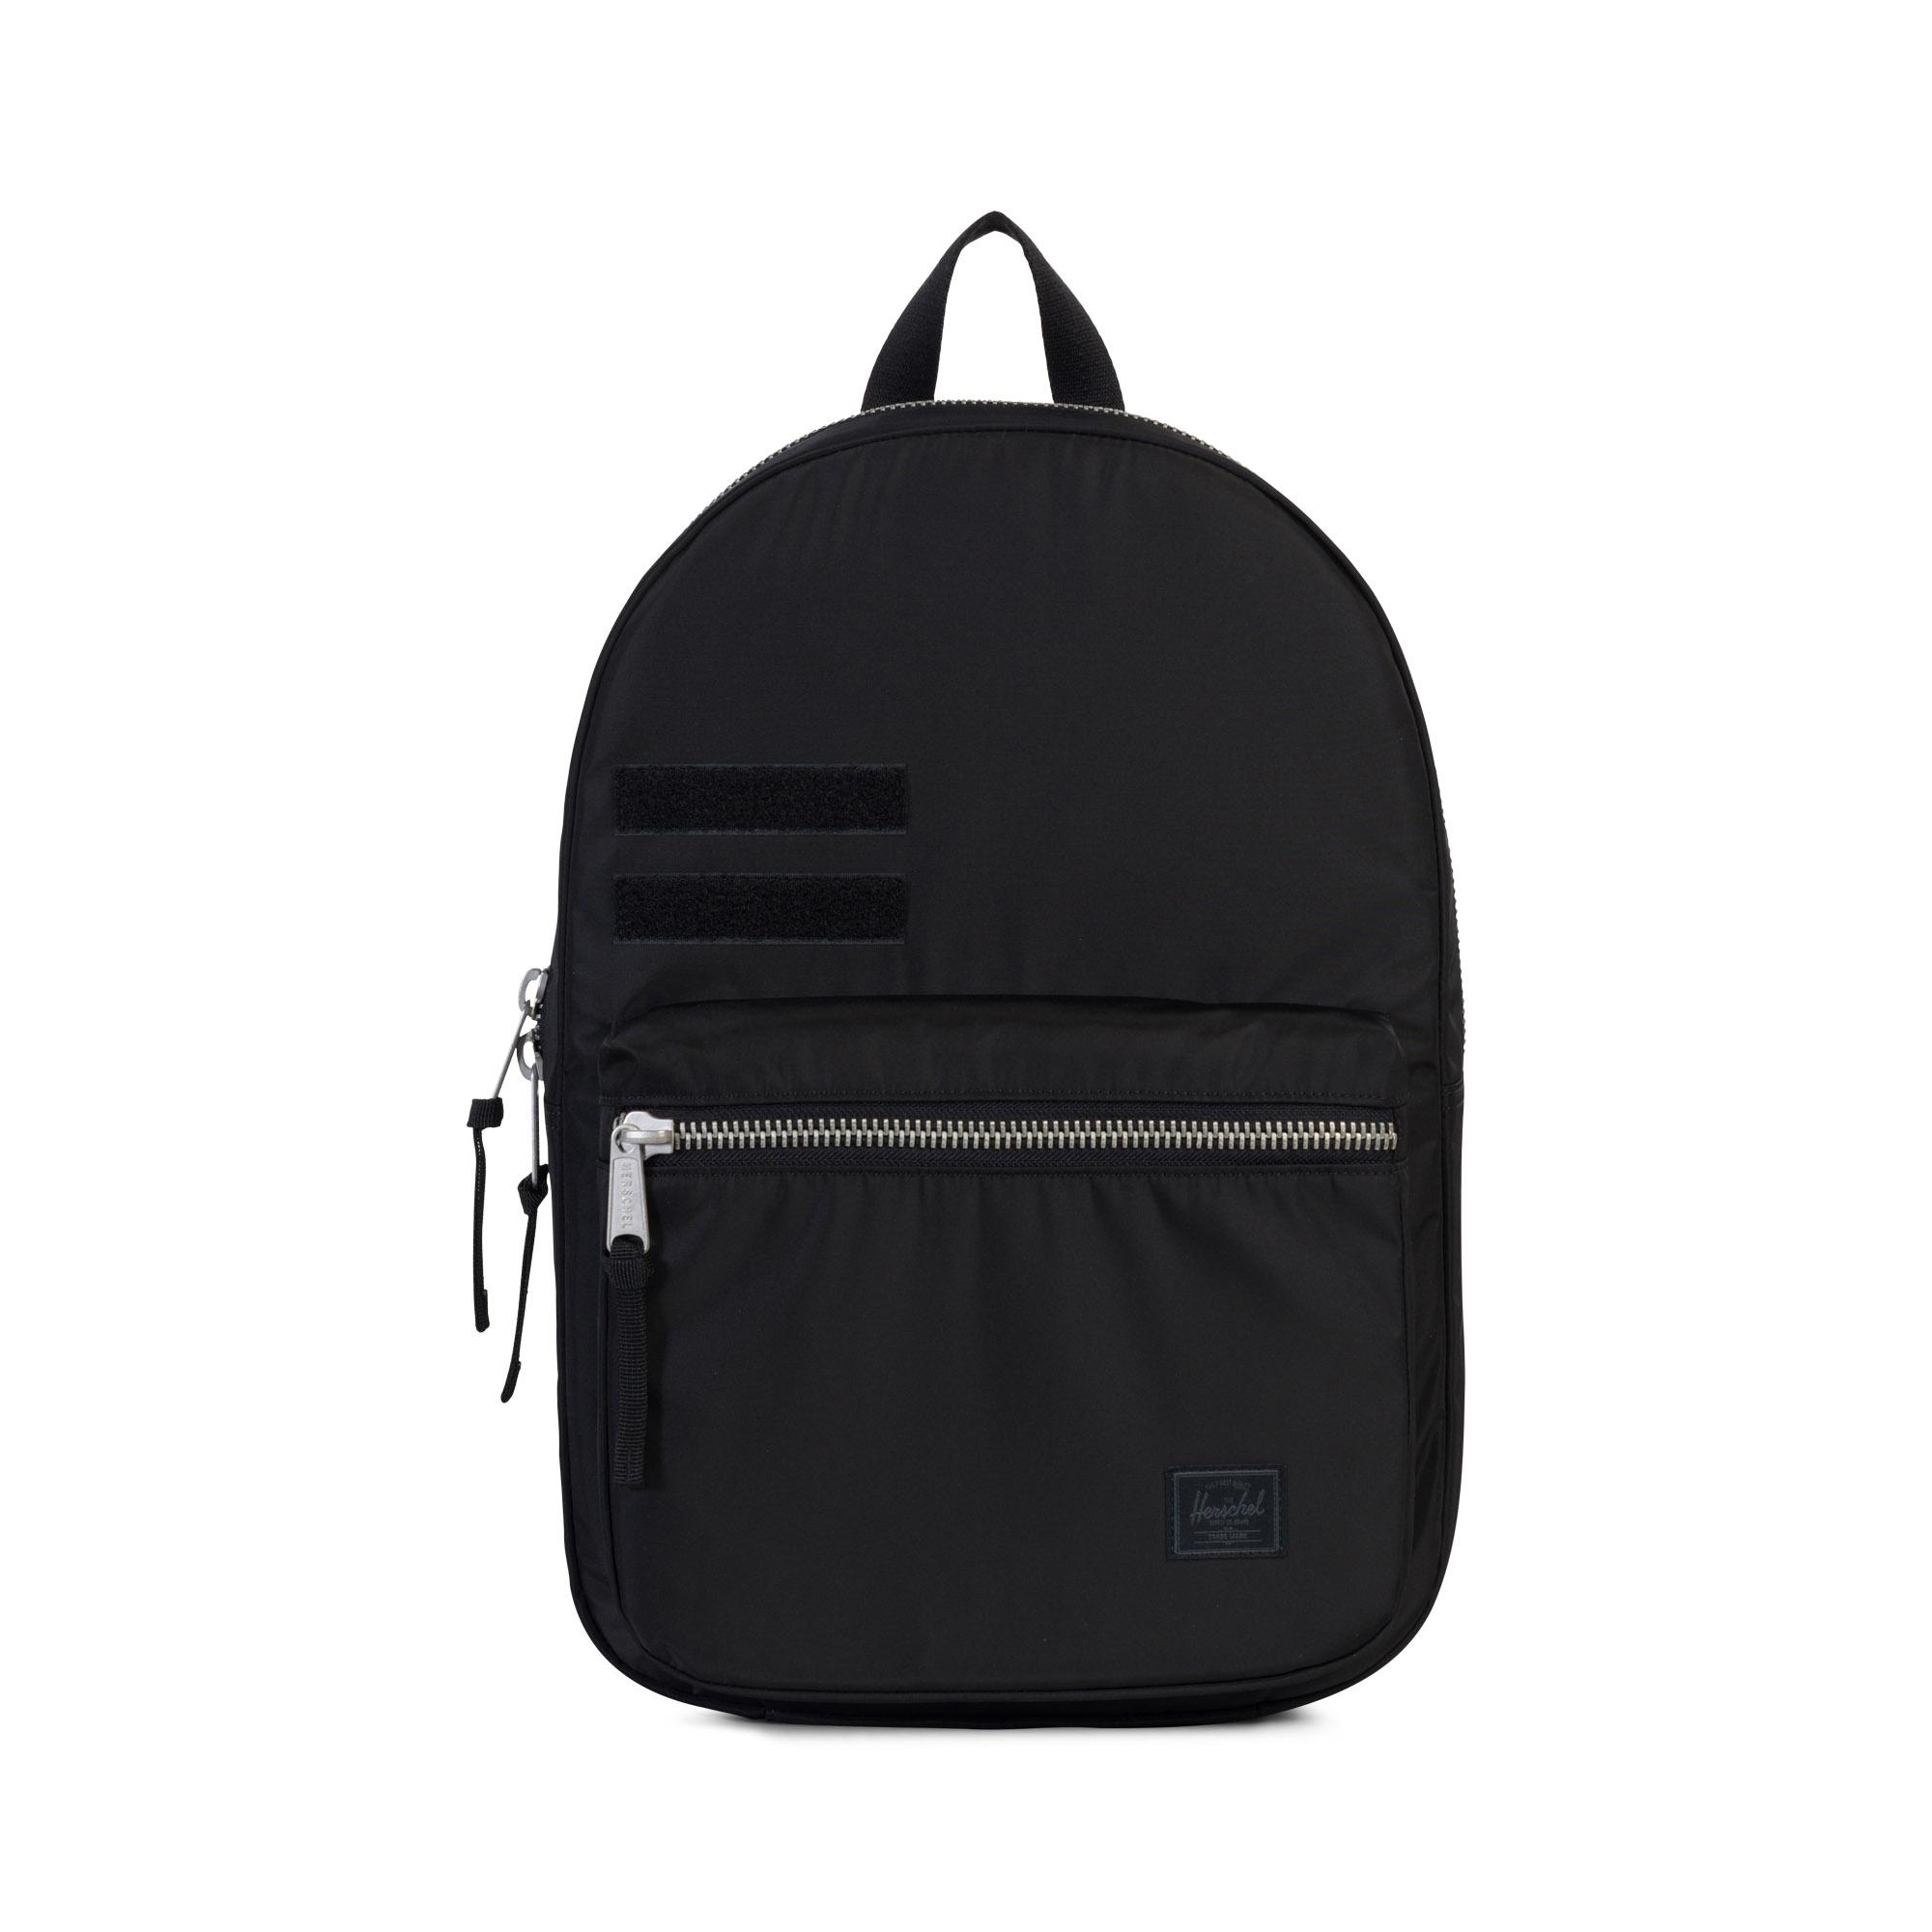 fde2e80f8c Lawson Backpack Surplus